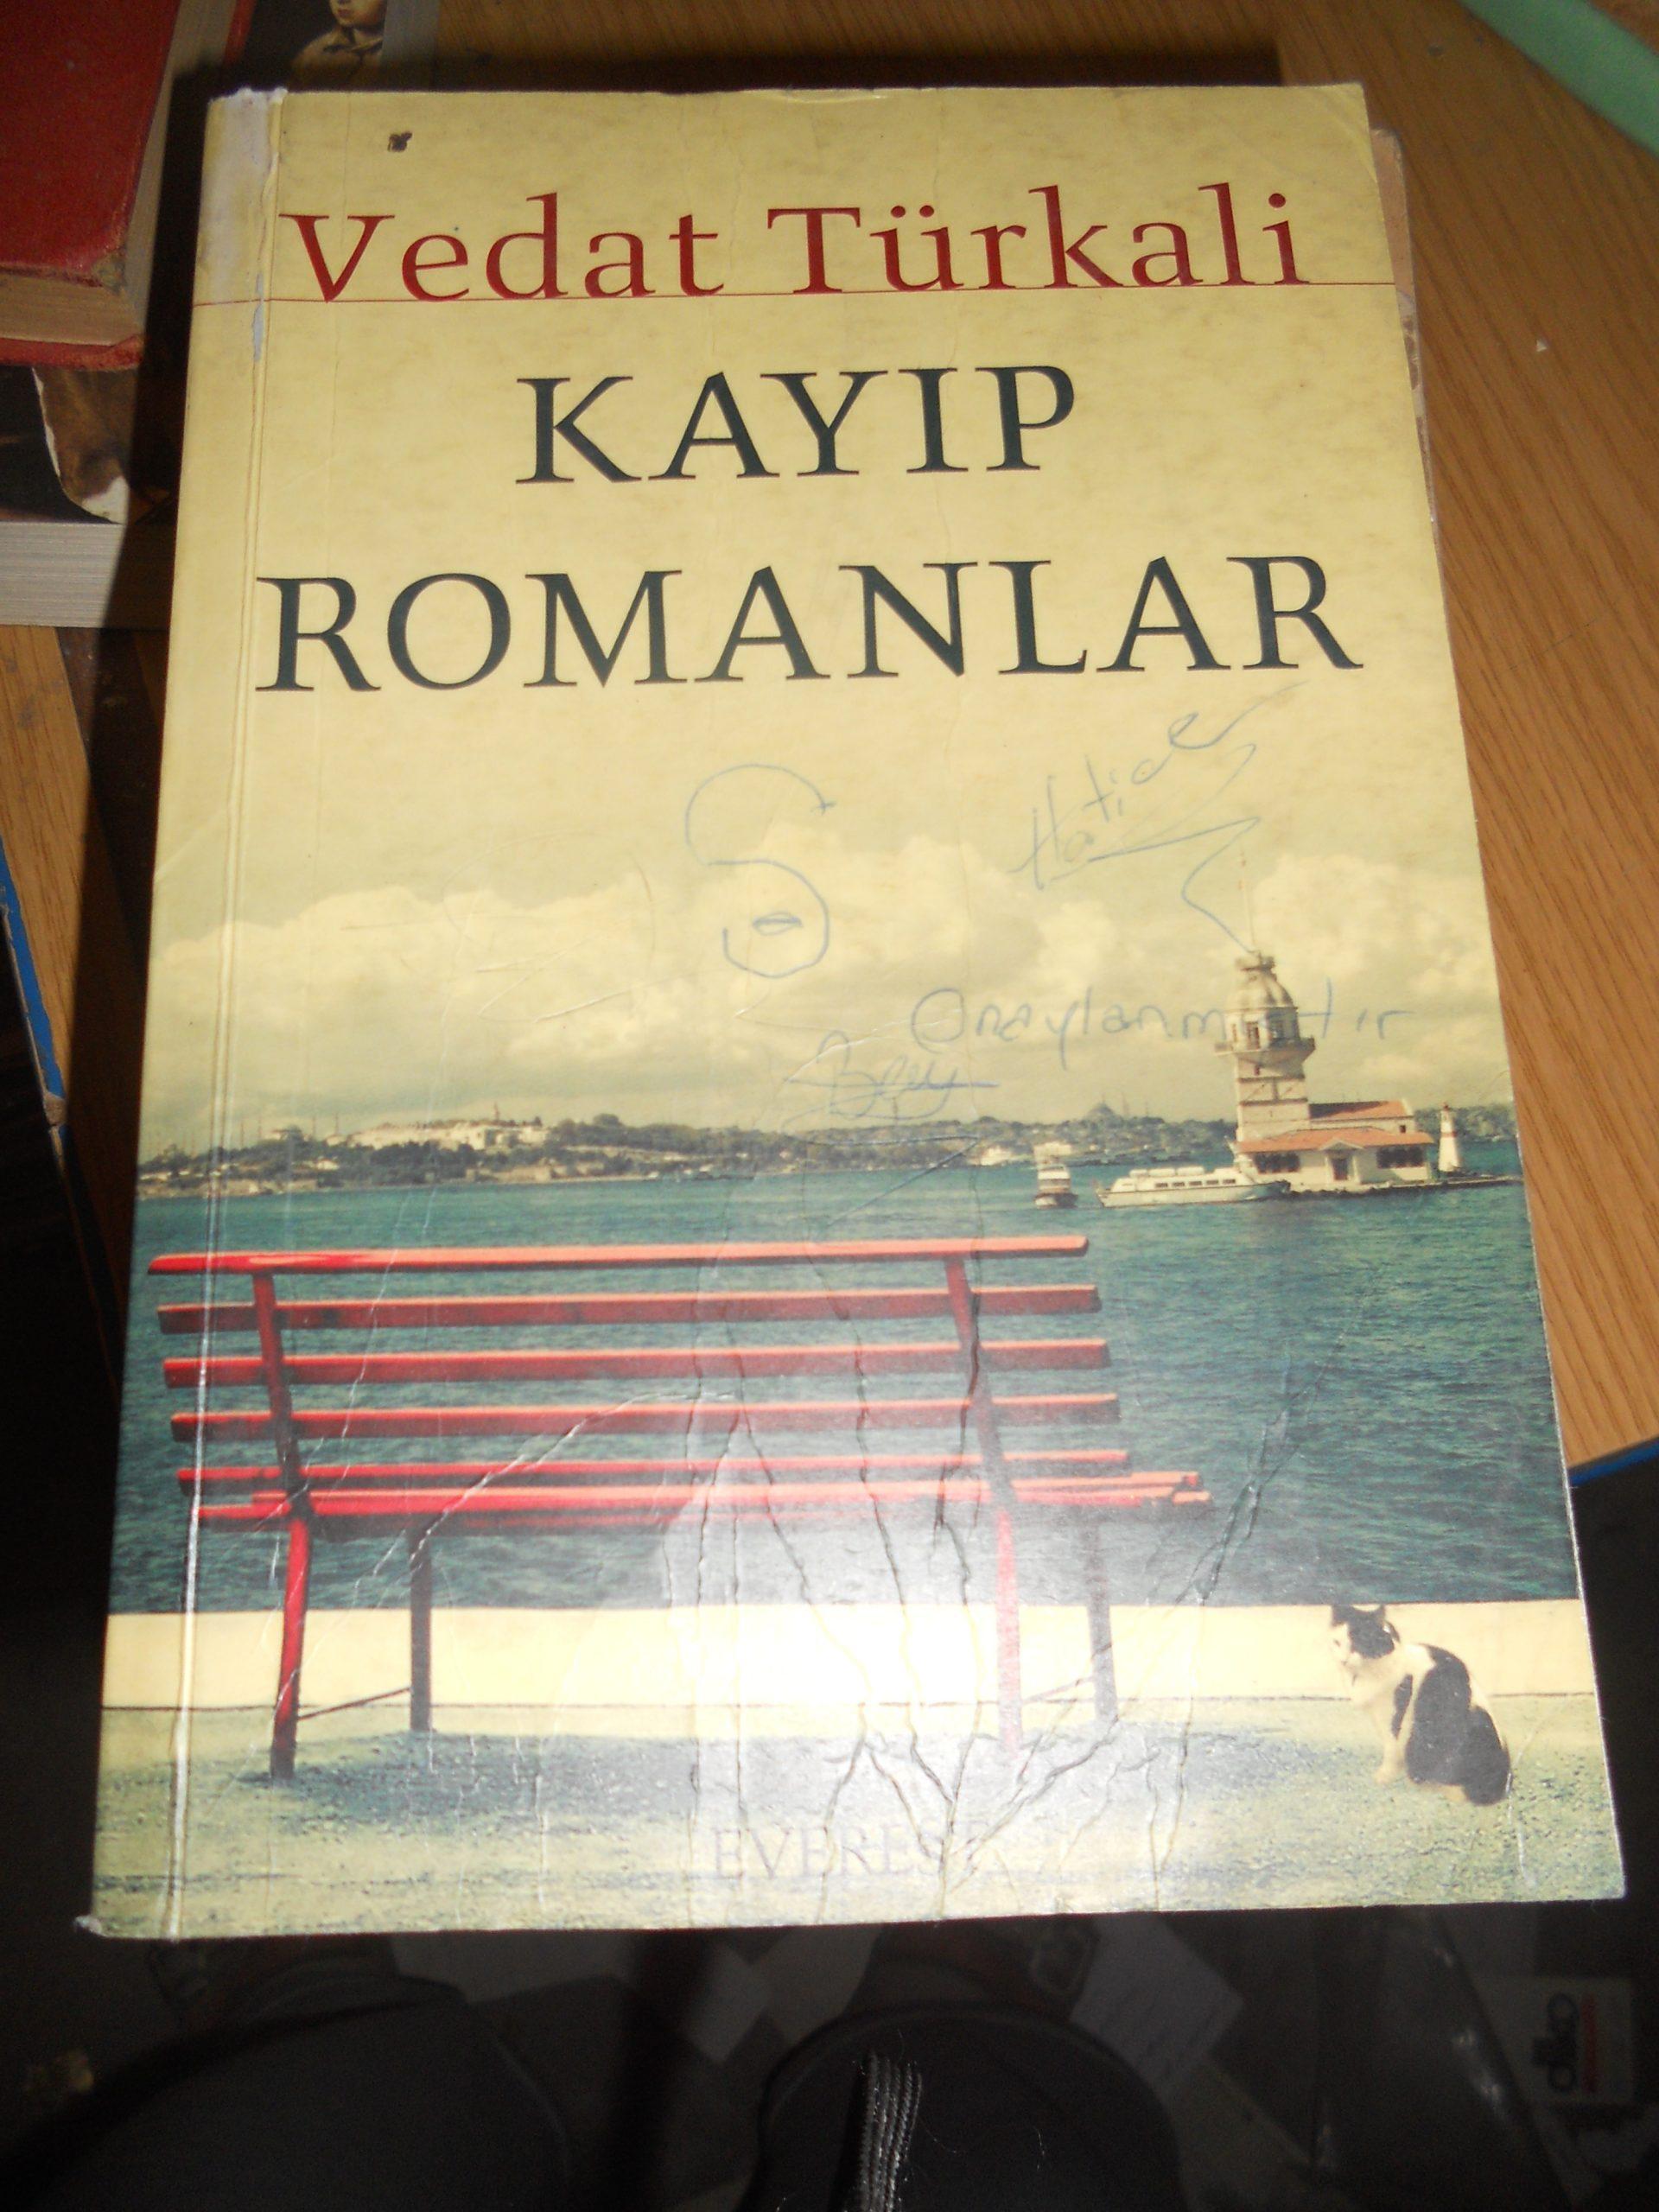 KAYIP ROMANLAR/Vedat TÜRKALİ/ 20 tl